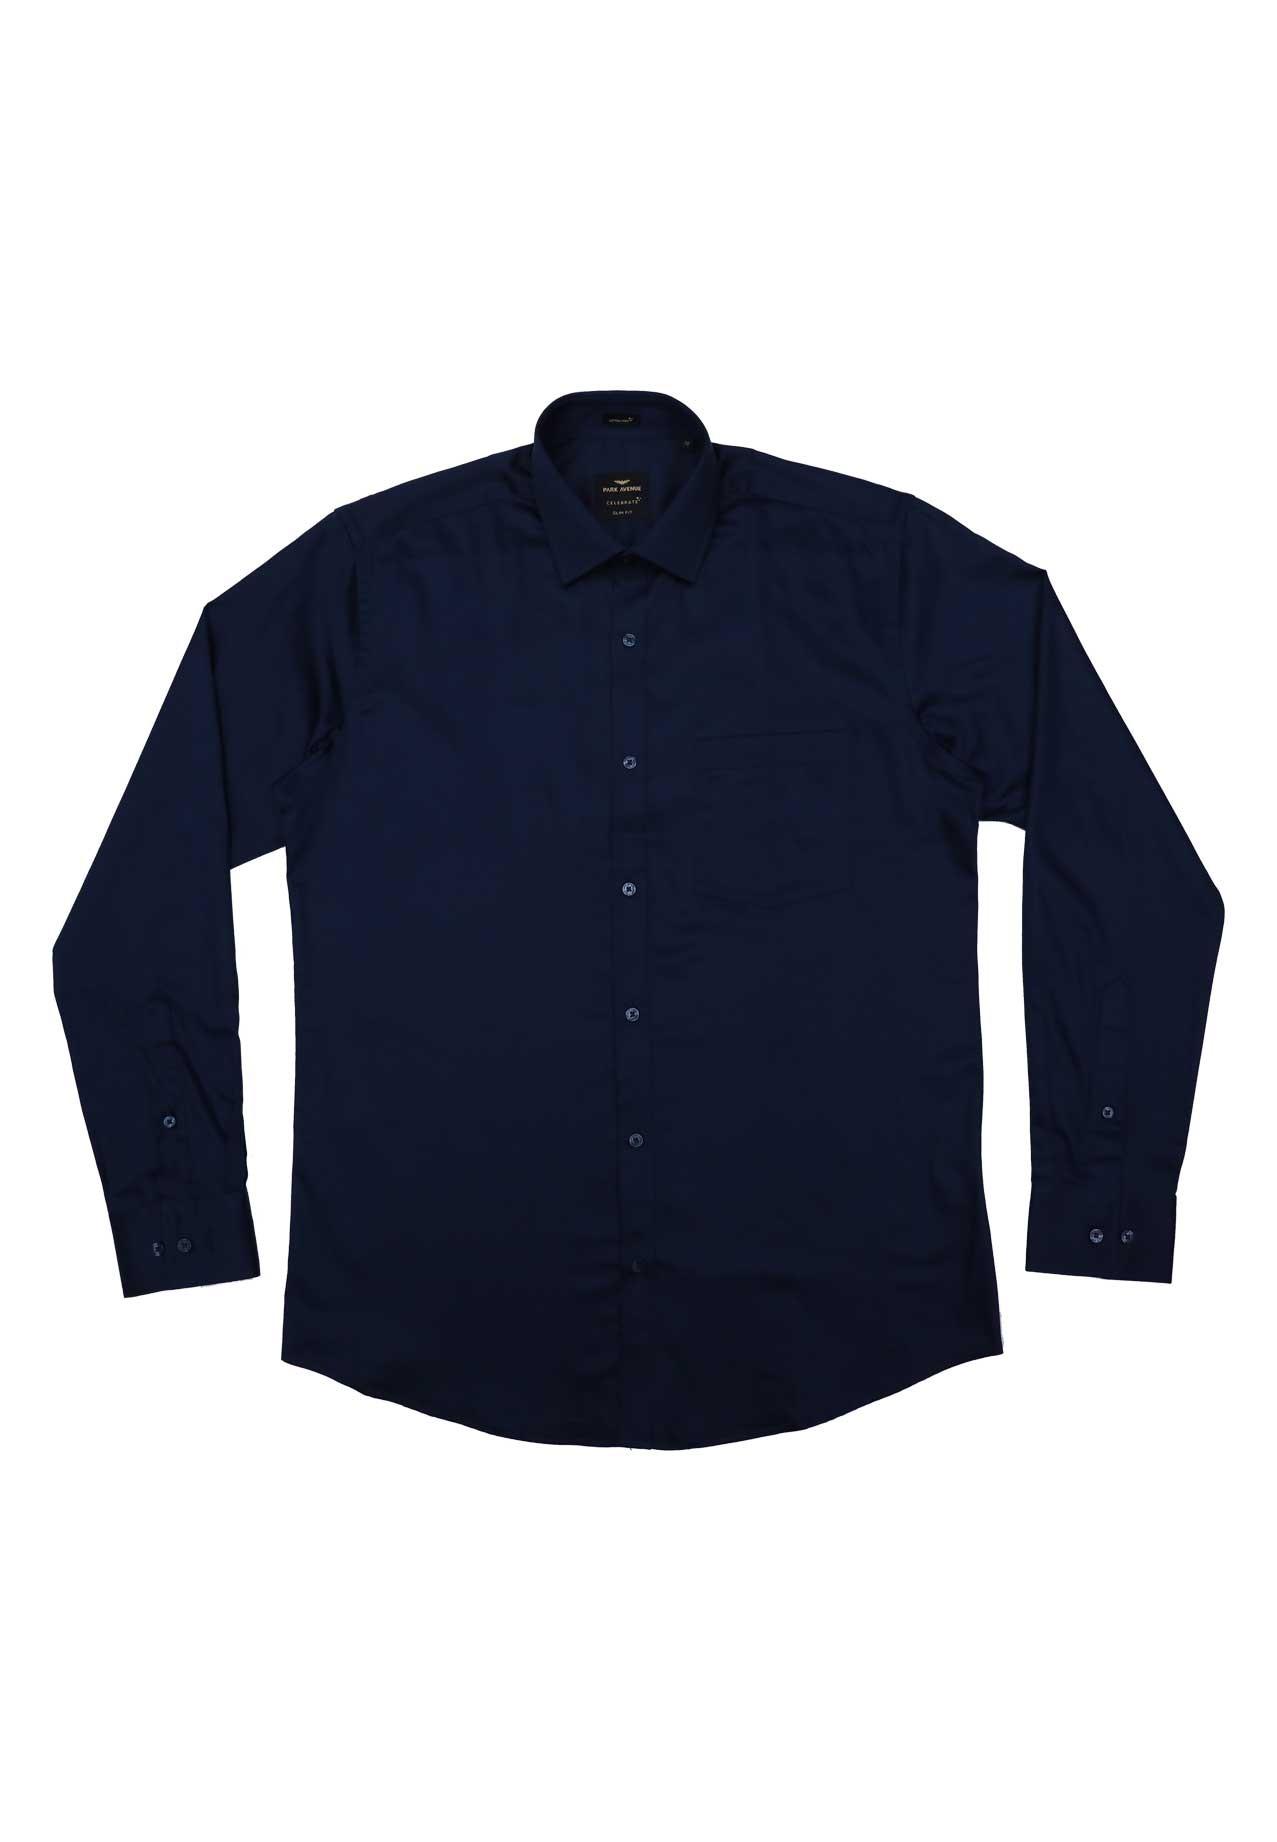 Park Avenue PISY00002-B8 Mens Shirt